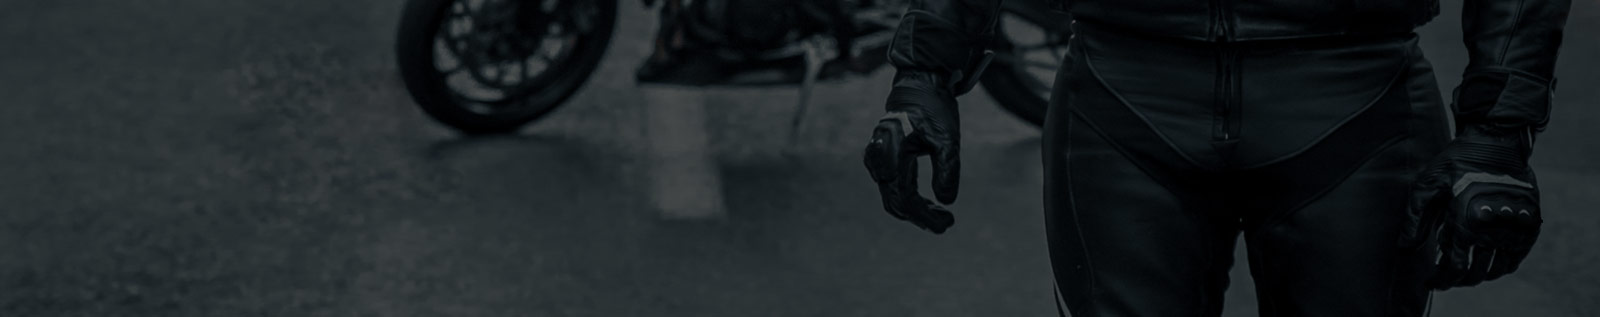 Motorbike Apparel